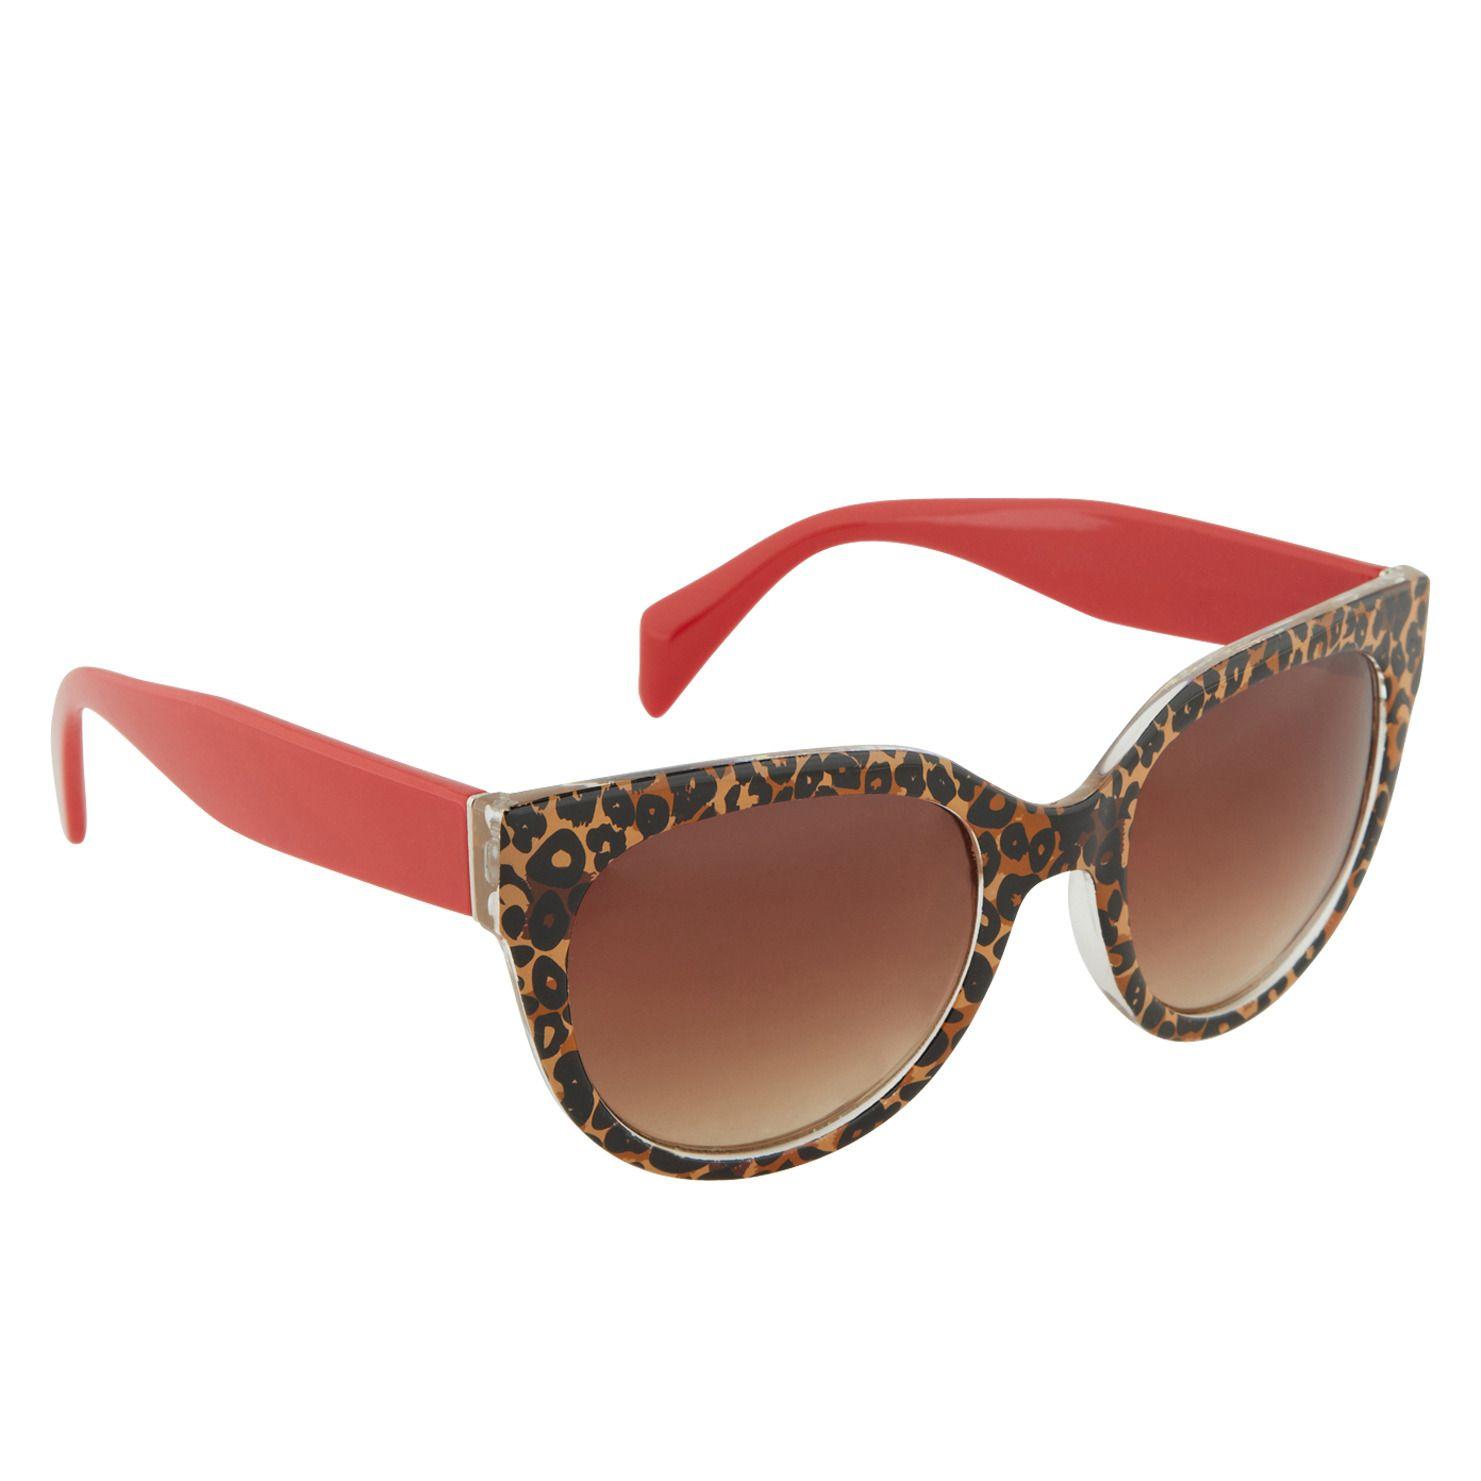 TRUHLAR - accessories's sunglasses women's for sale at ALDO Shoes.